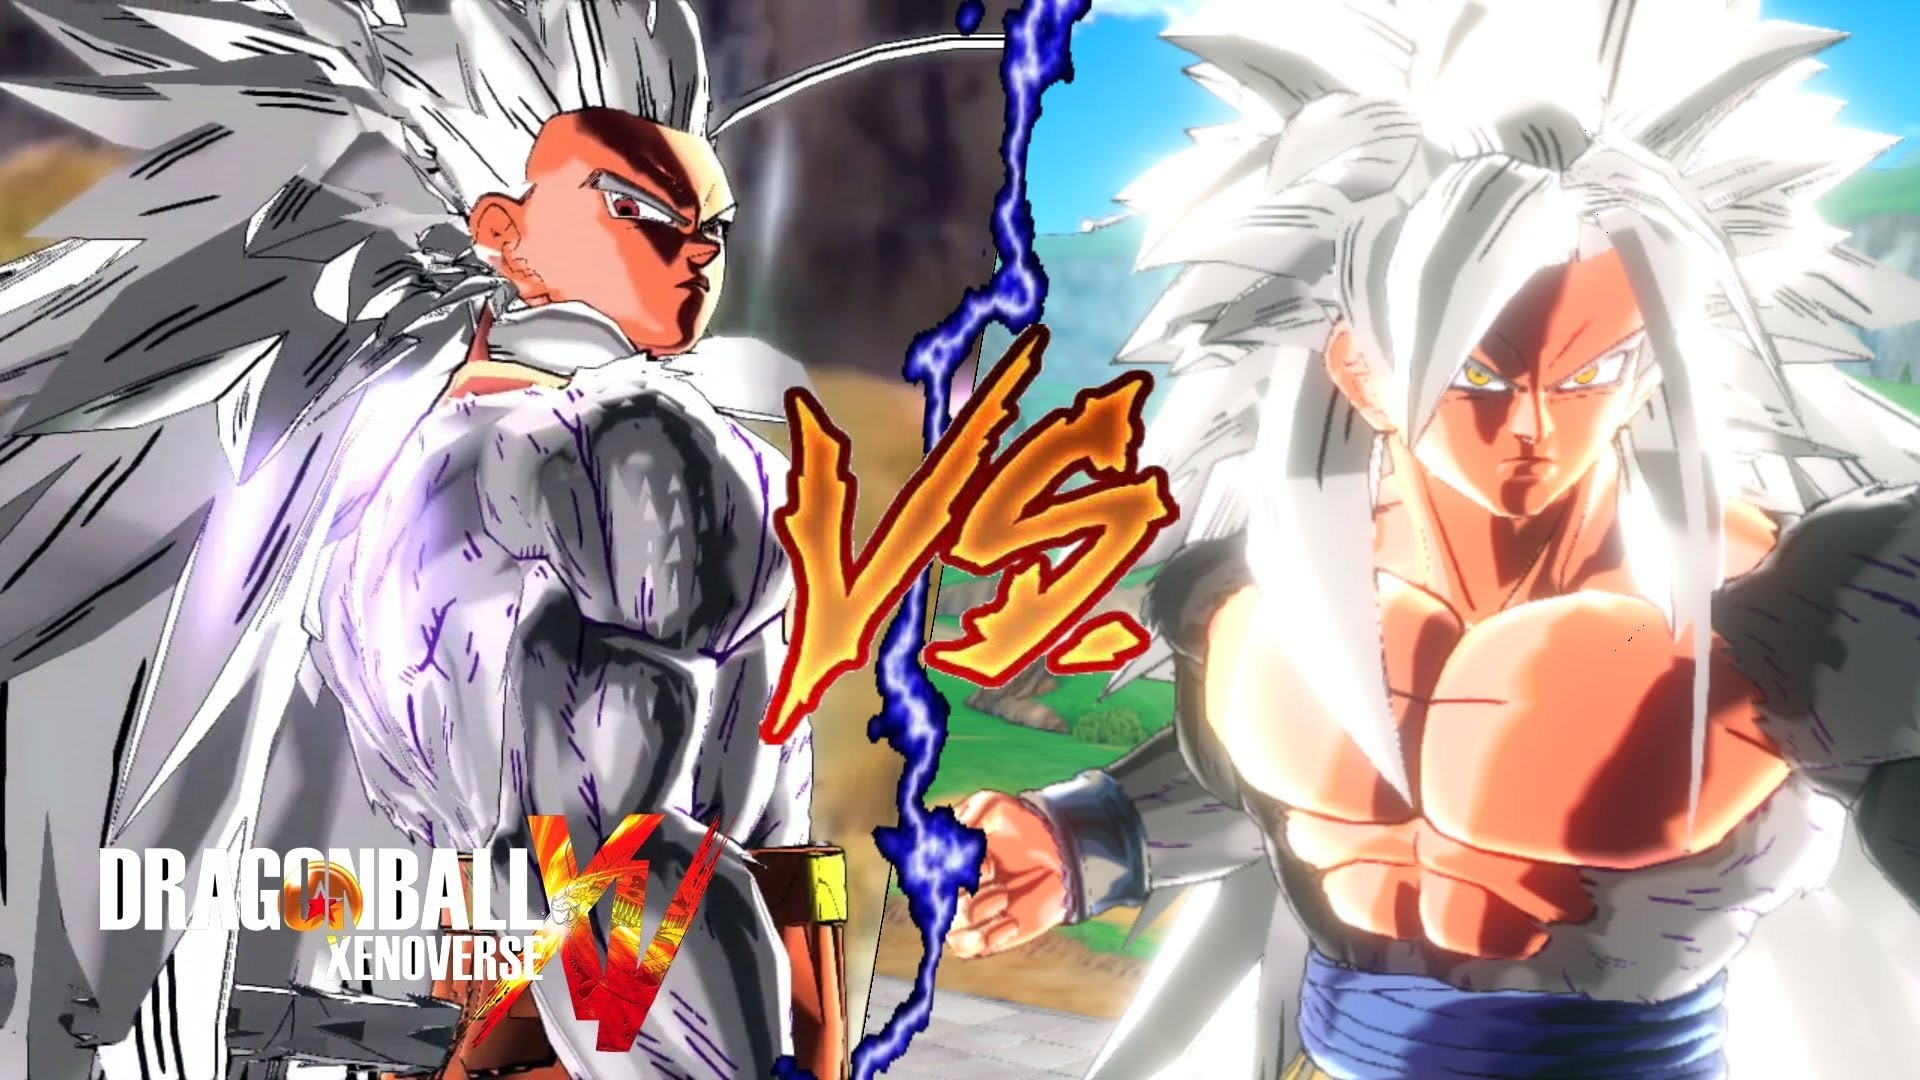 Dragon Ball Xenoverse (PC): Super Saiyan 4 Gohan VS. Super Saiyan 5  Goku【MOD】